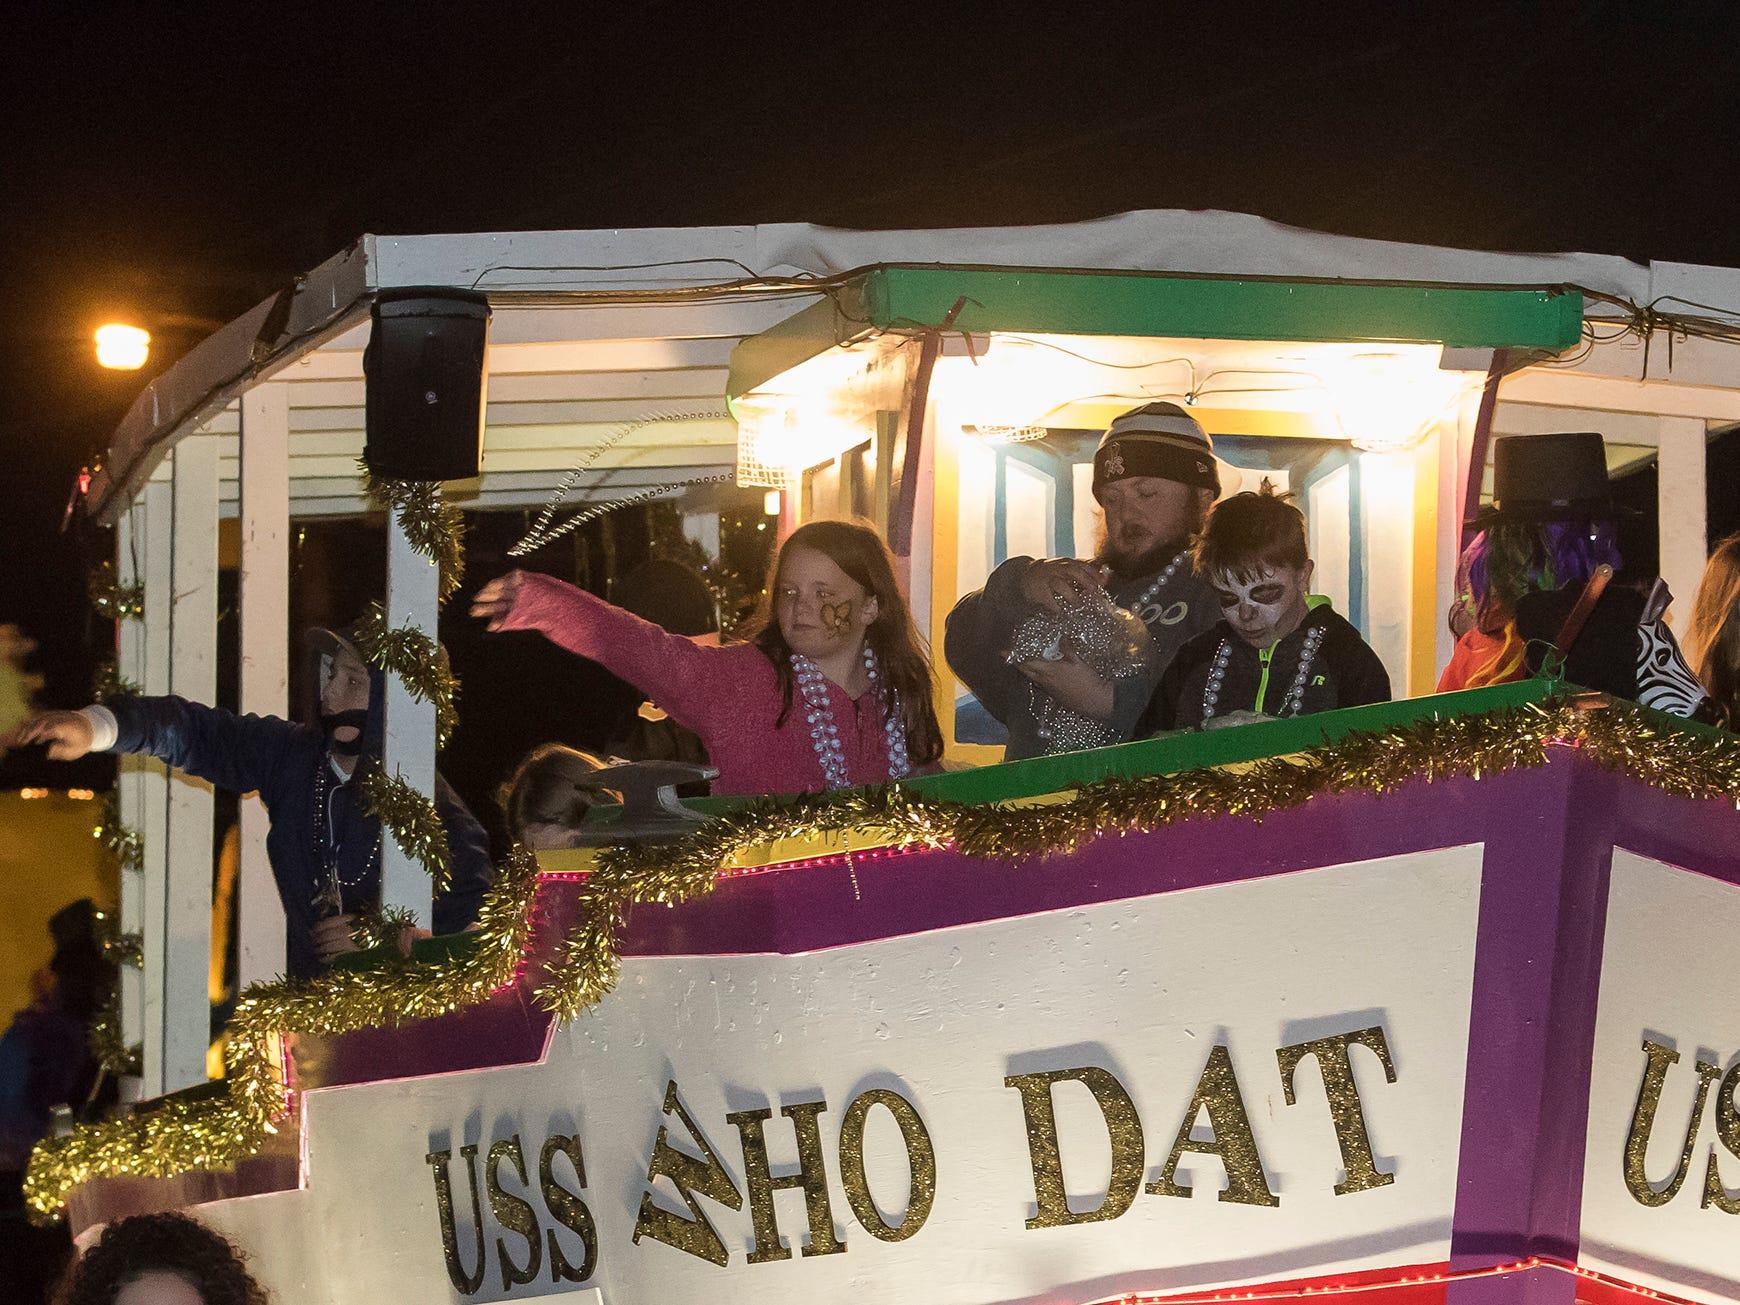 The Krewe of Janus held its annual Mardi Gras parade through West Monroe and Monroe, La. on Feb. 16.